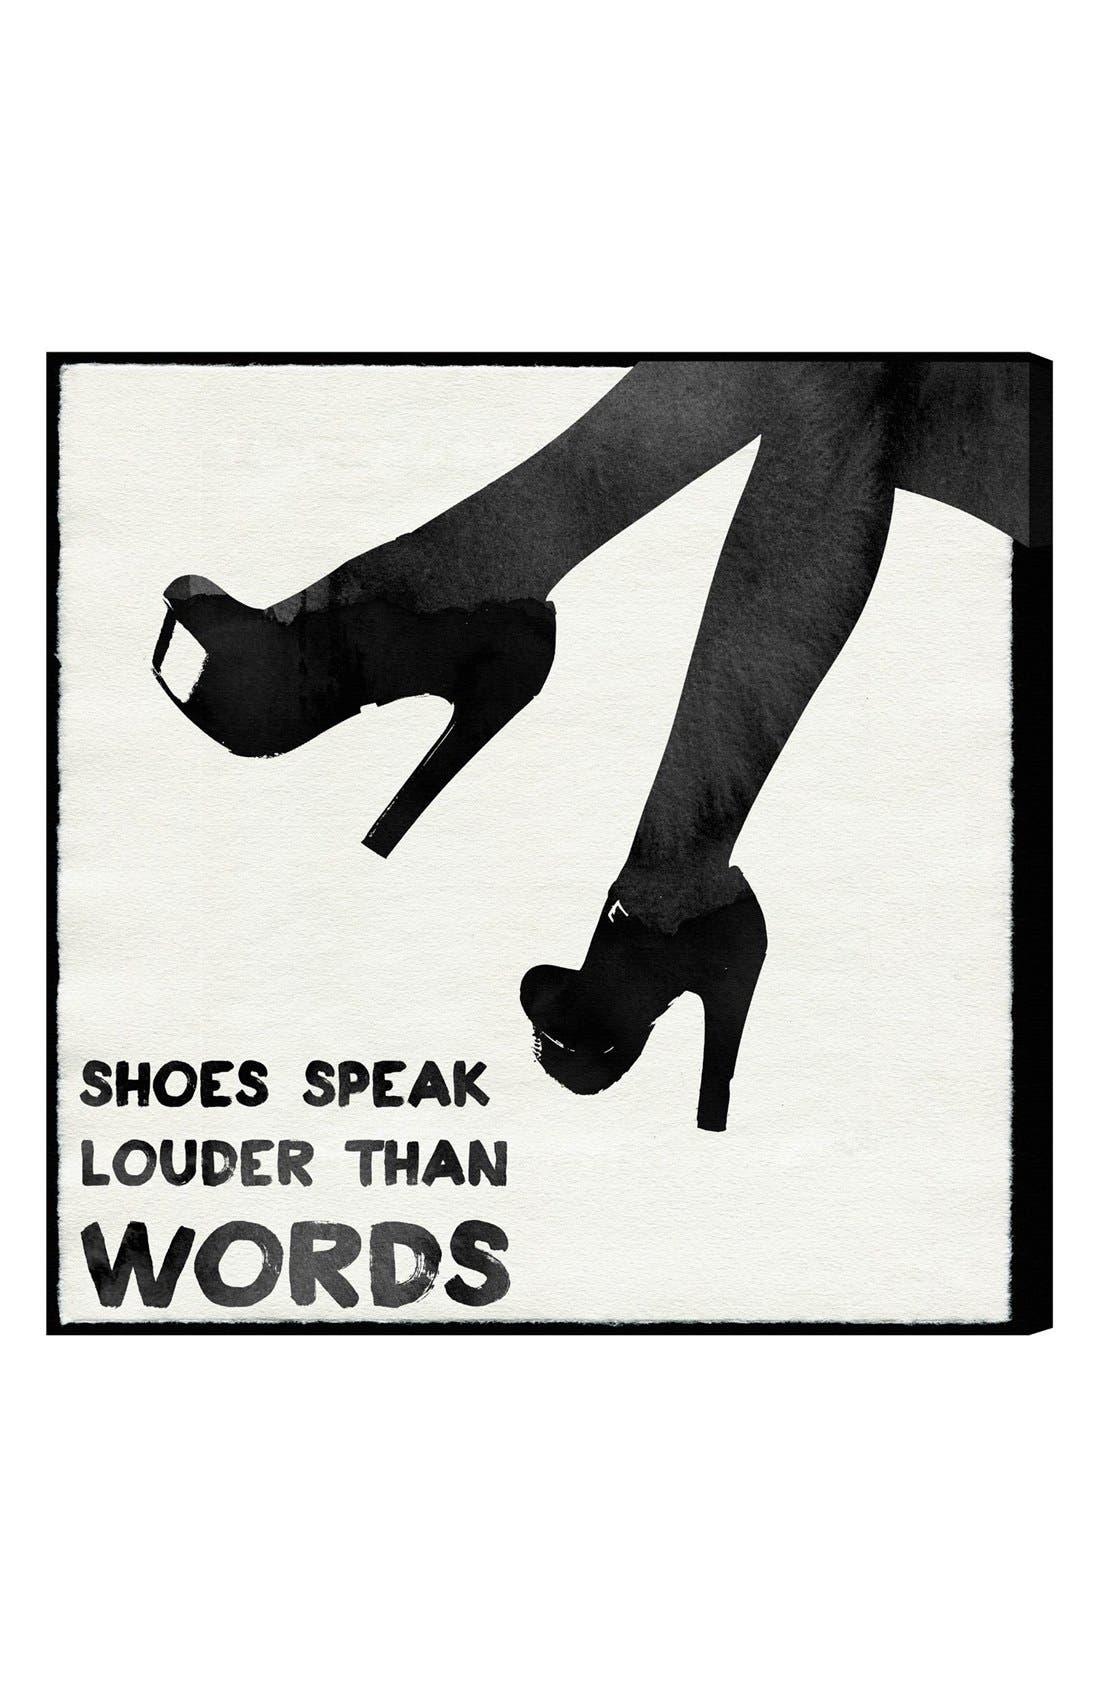 Alternate Image 1 Selected - Oliver Gal 'Shoes Speak Louder than Words' Wall Art